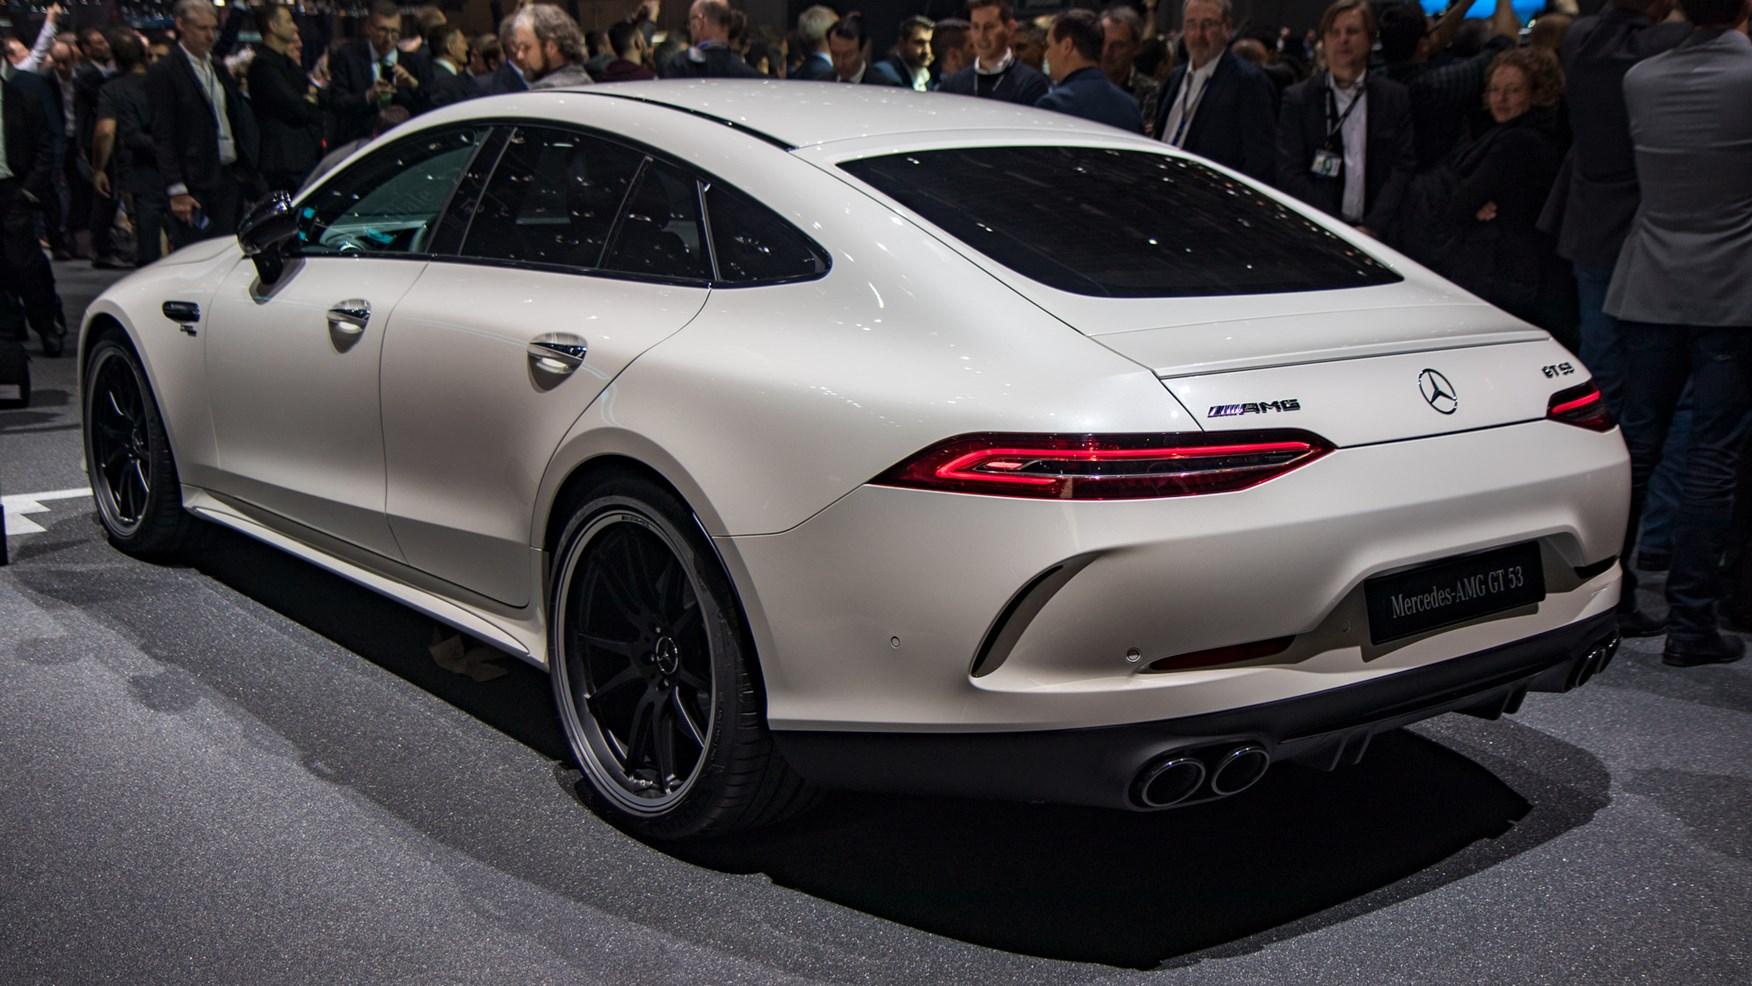 Mercedes-AMG GT 4-door: first ride impressions | CAR Magazine